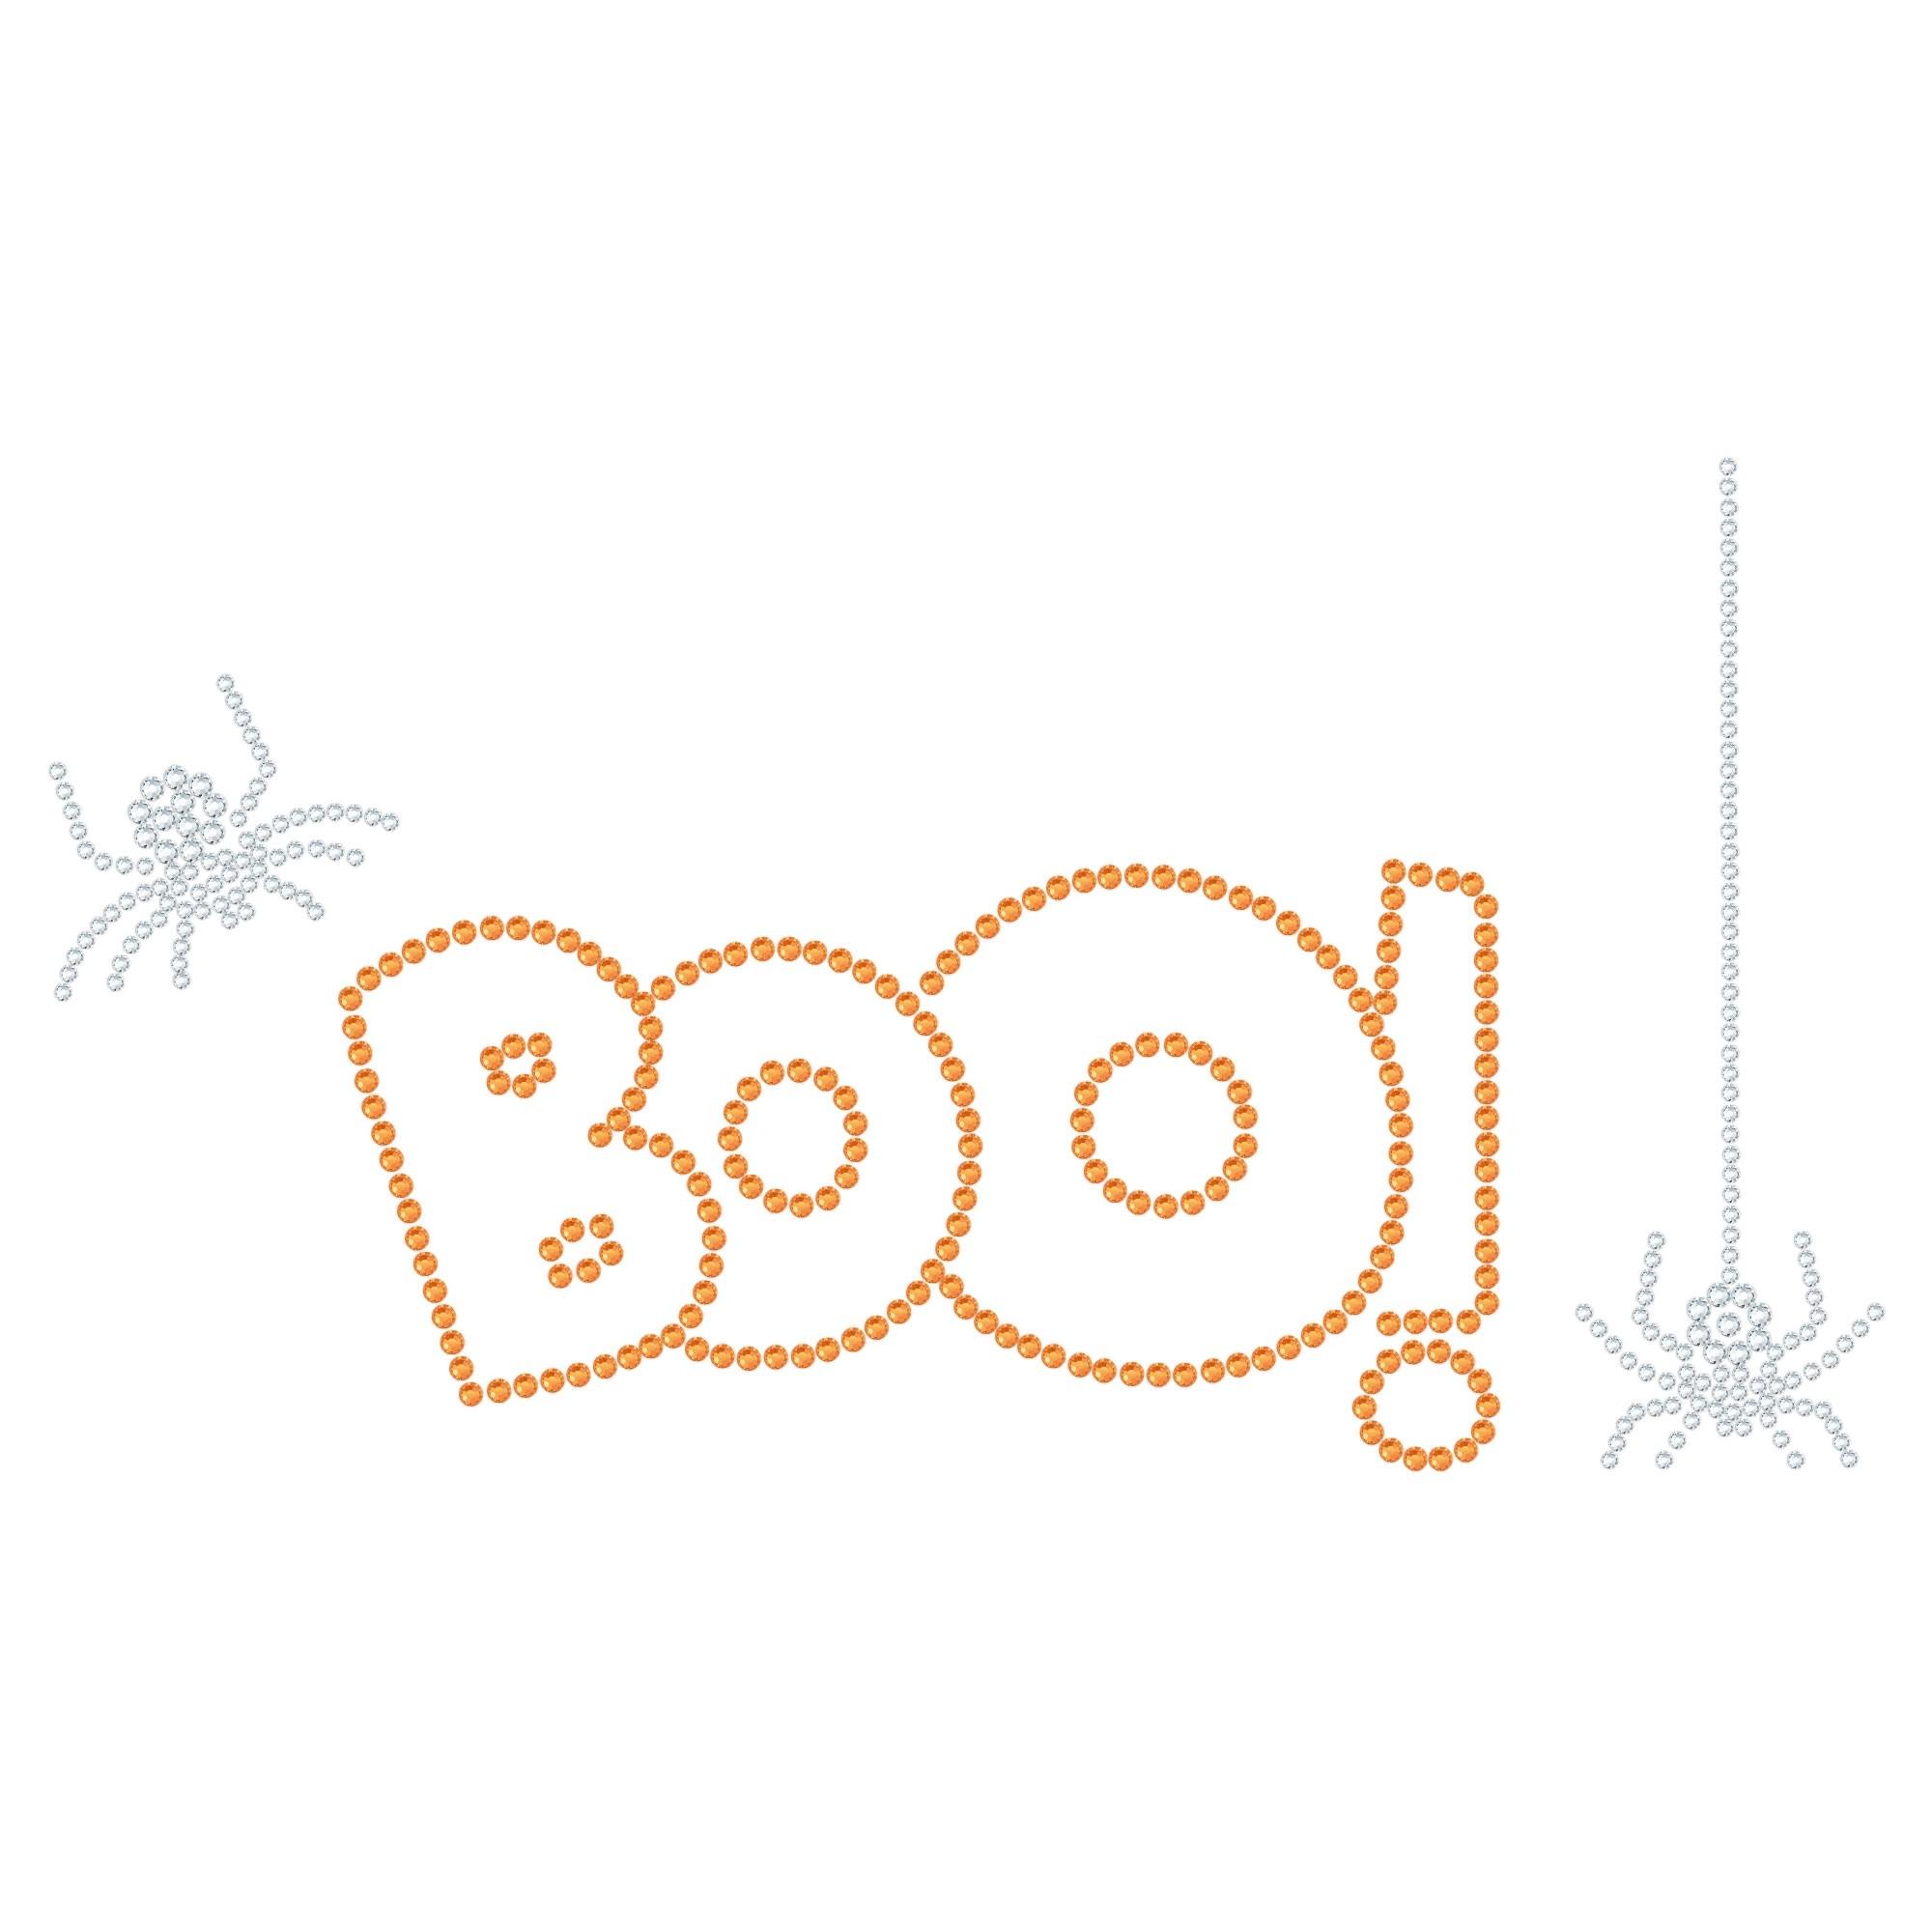 "Halloween Hotfix Rhinestone Transfer ""Boo"" 226x124mm"